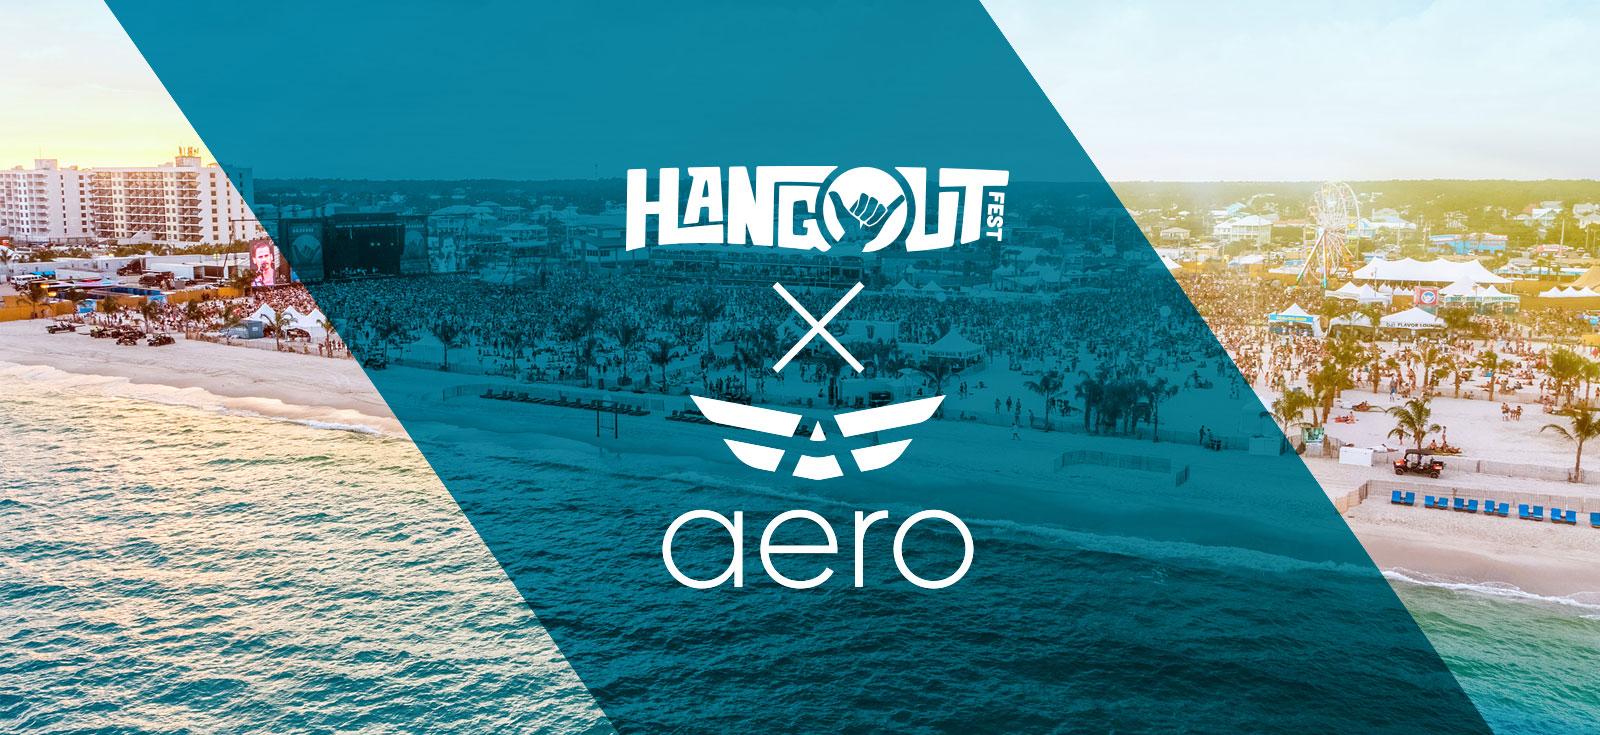 HangoutxAeroHeader.jpg